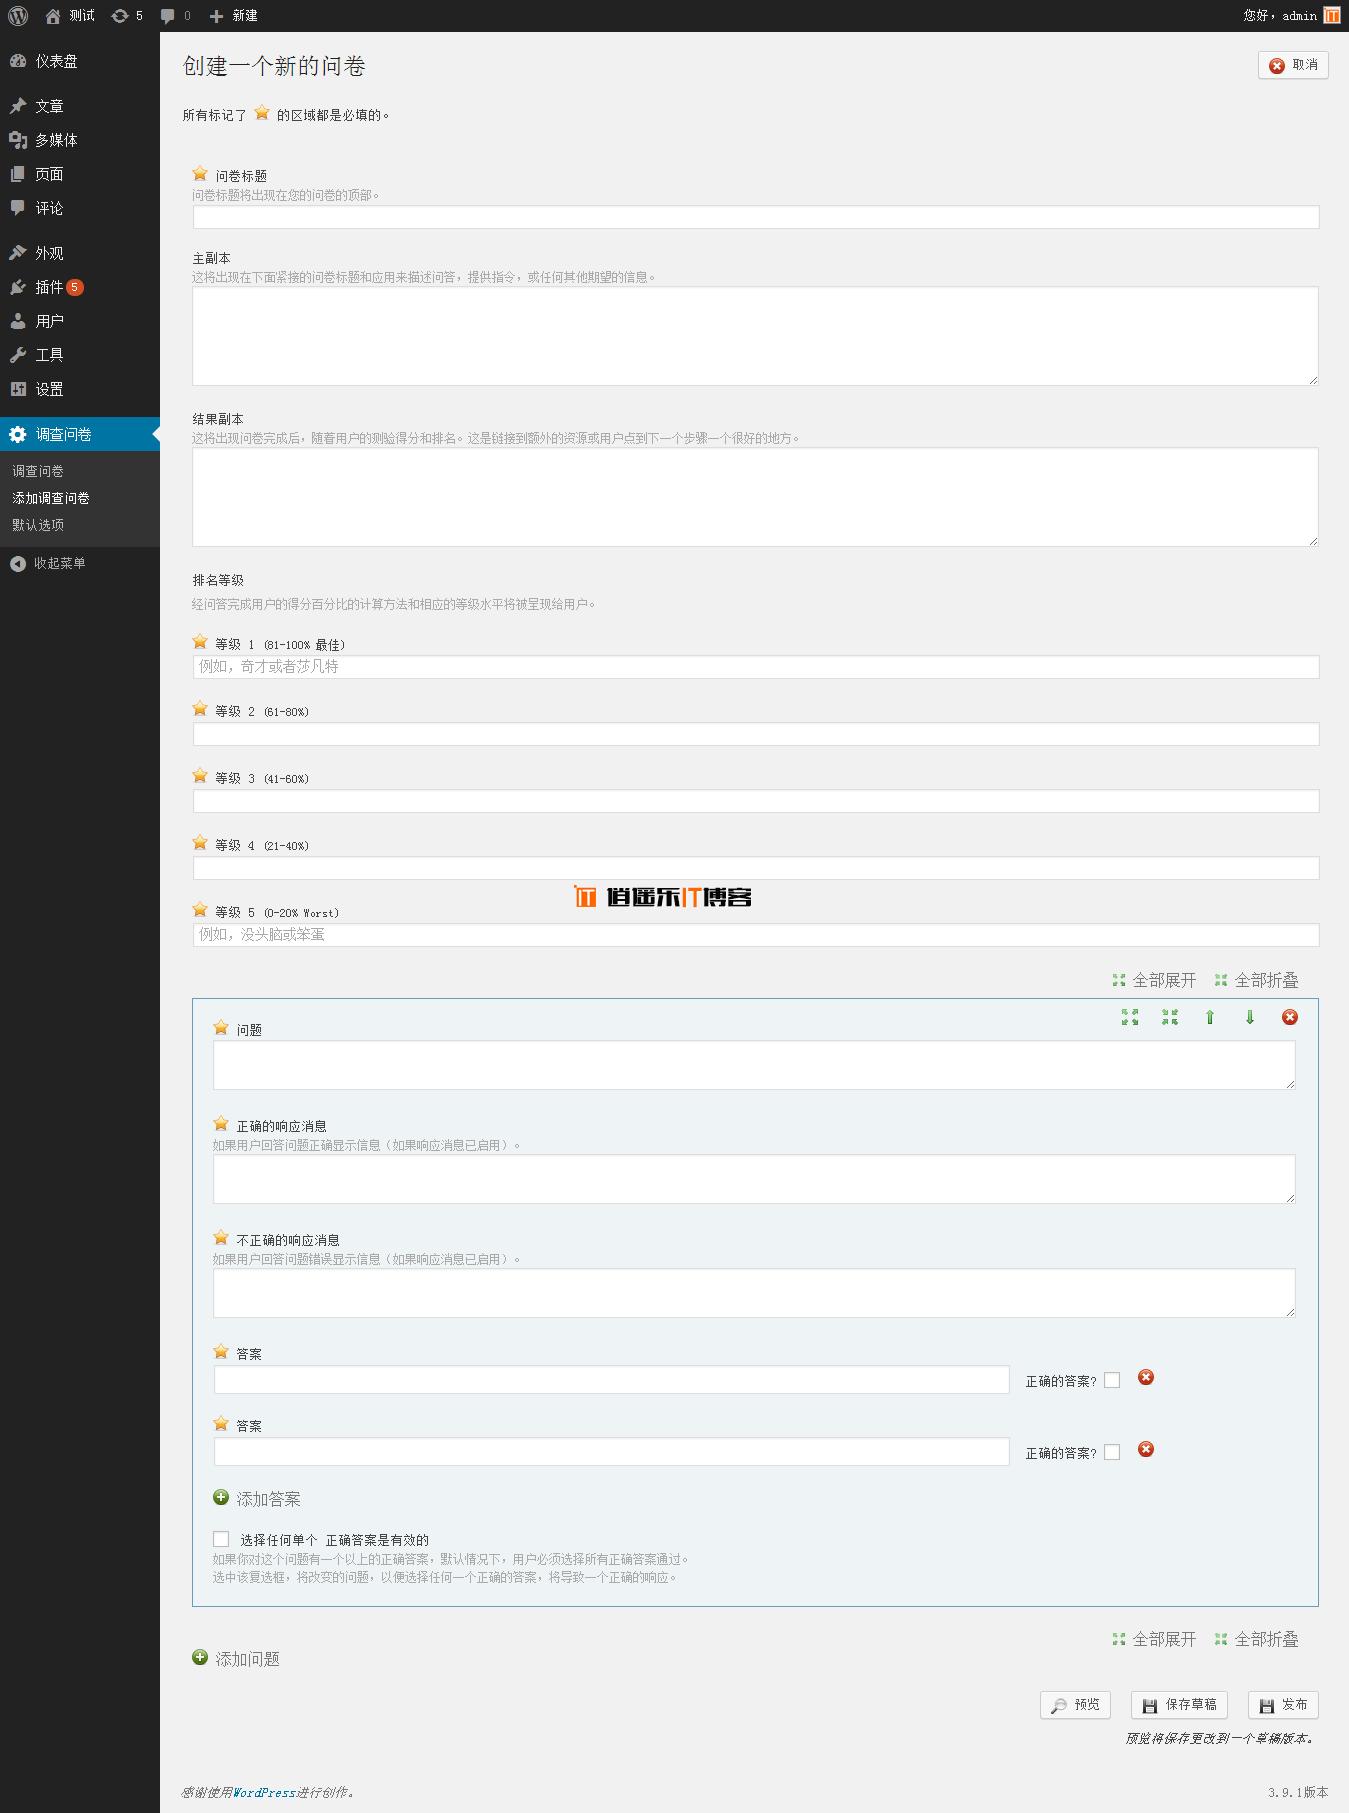 WordPress 问卷调查/考试插件:SlickQuiz 逍遥乐汉化版中文版